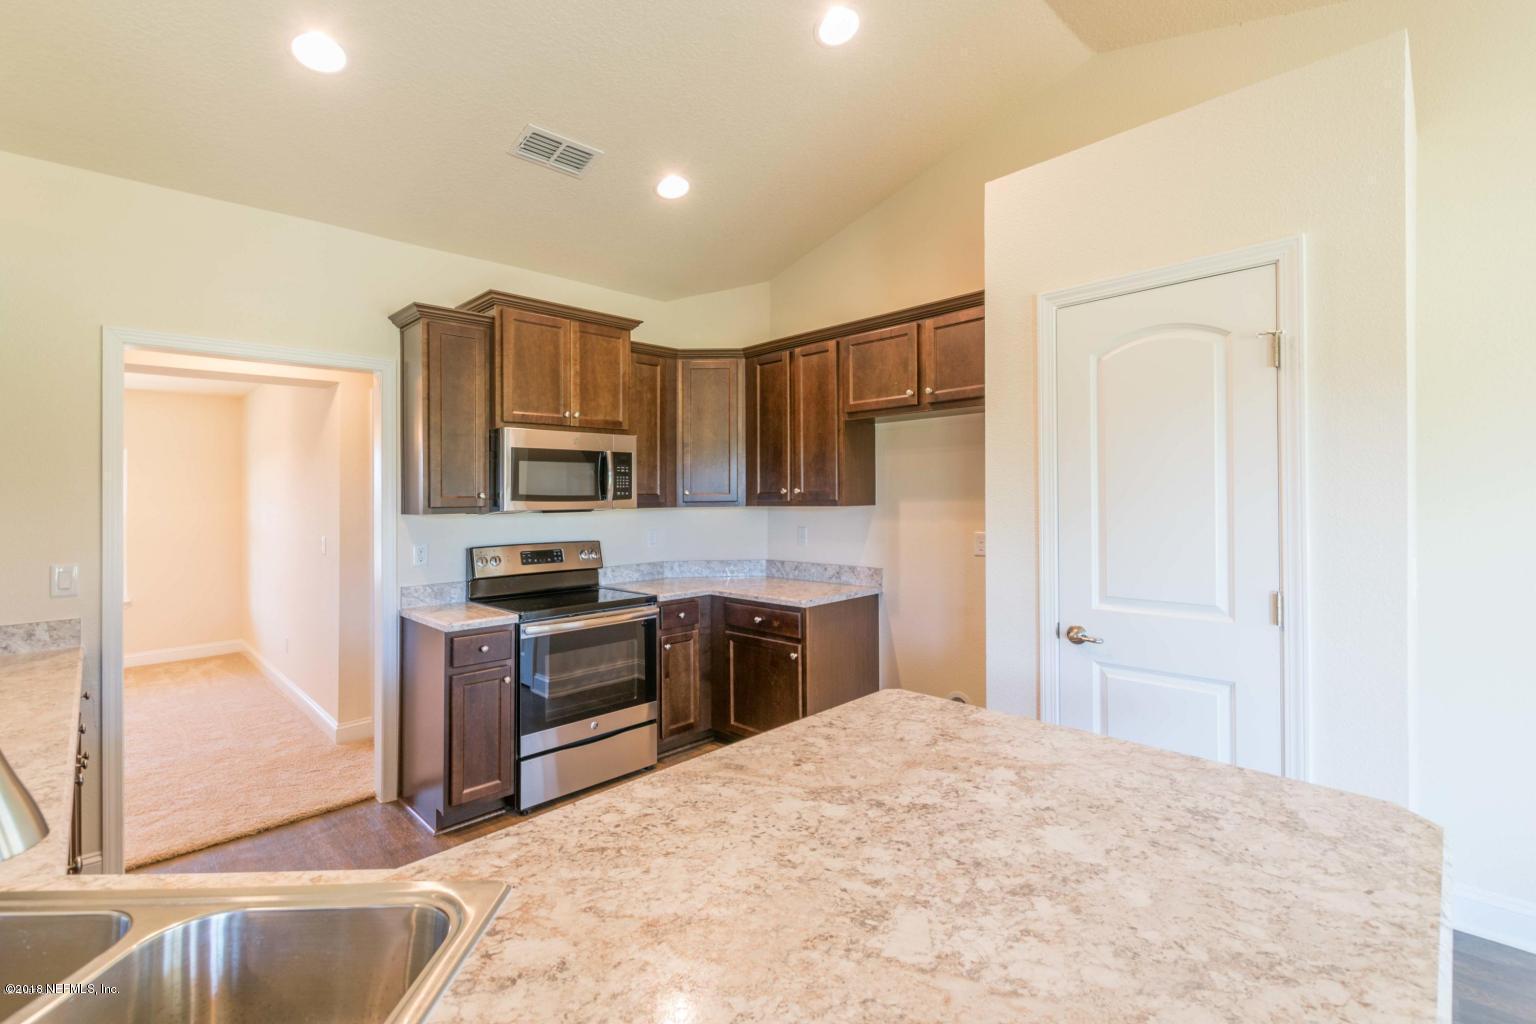 12283 DEWHURST, JACKSONVILLE, FLORIDA 32218, 3 Bedrooms Bedrooms, ,2 BathroomsBathrooms,Residential - single family,For sale,DEWHURST,952837